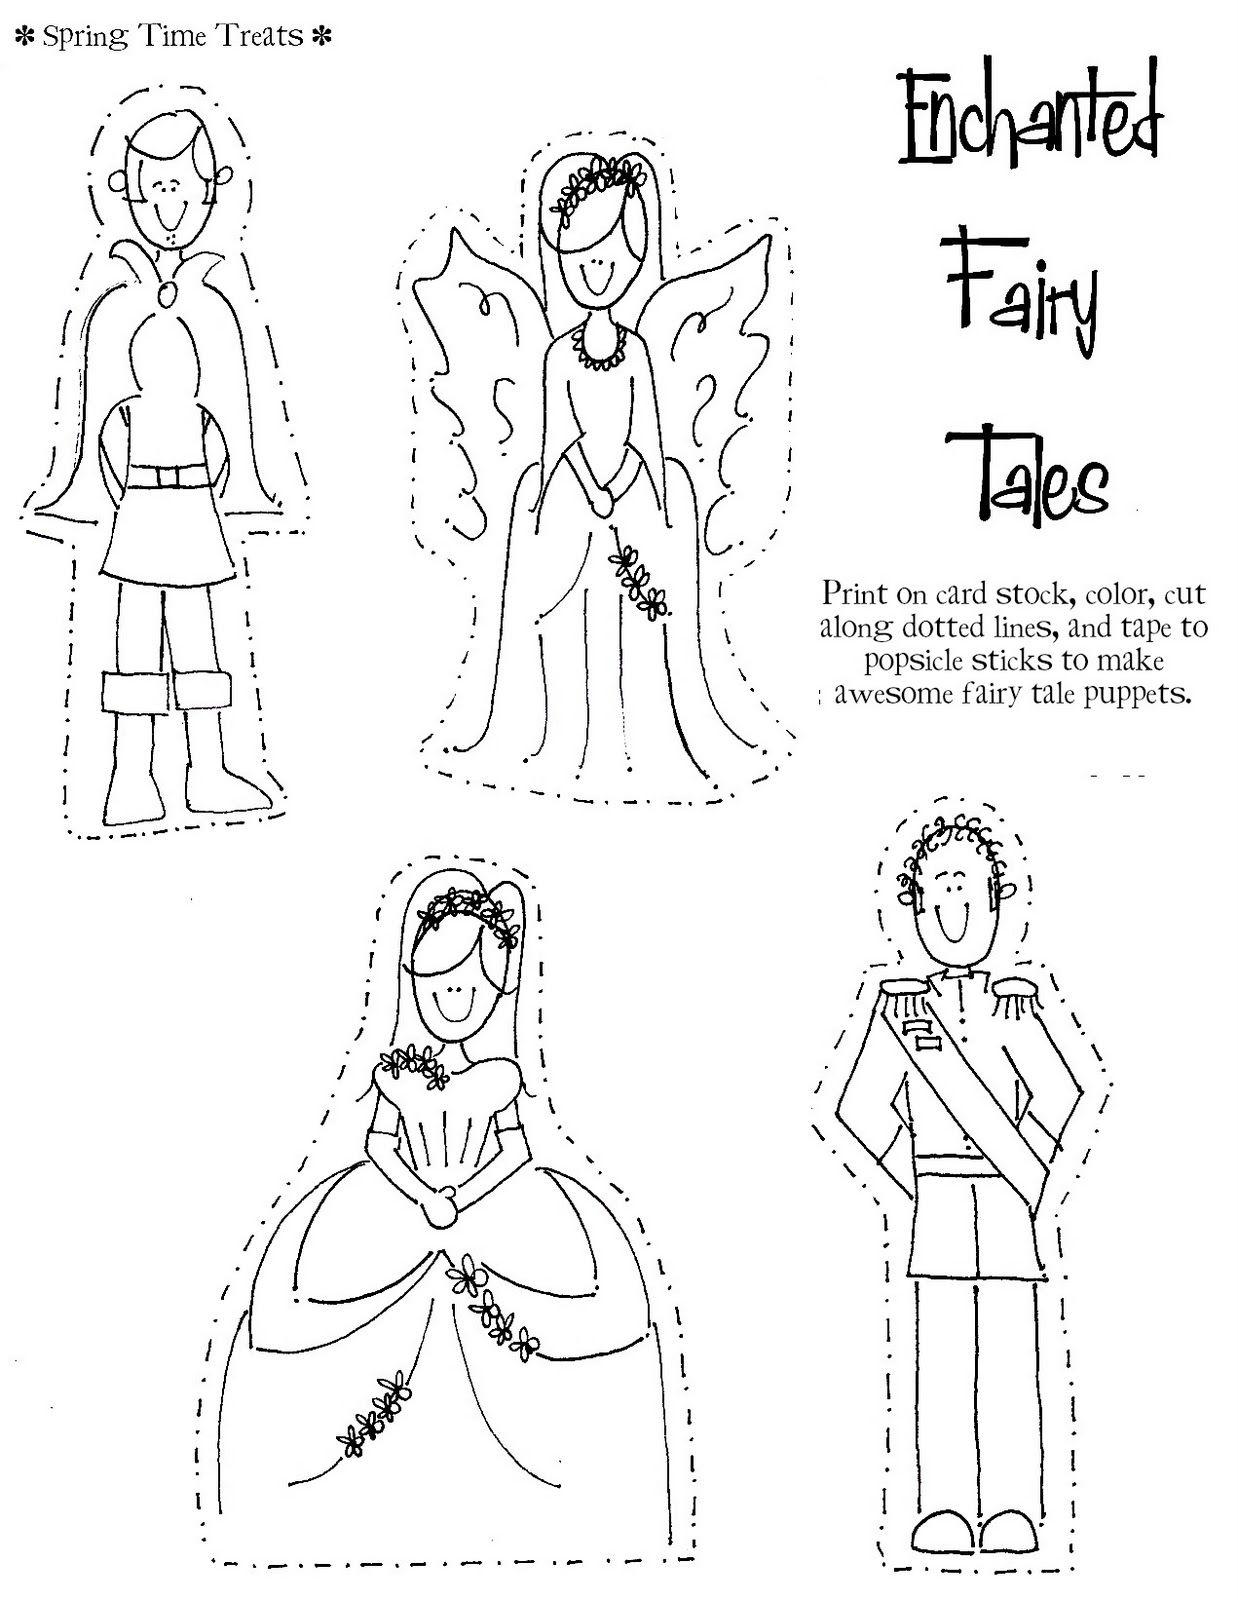 spring time treats free printables fairy ballerina princess